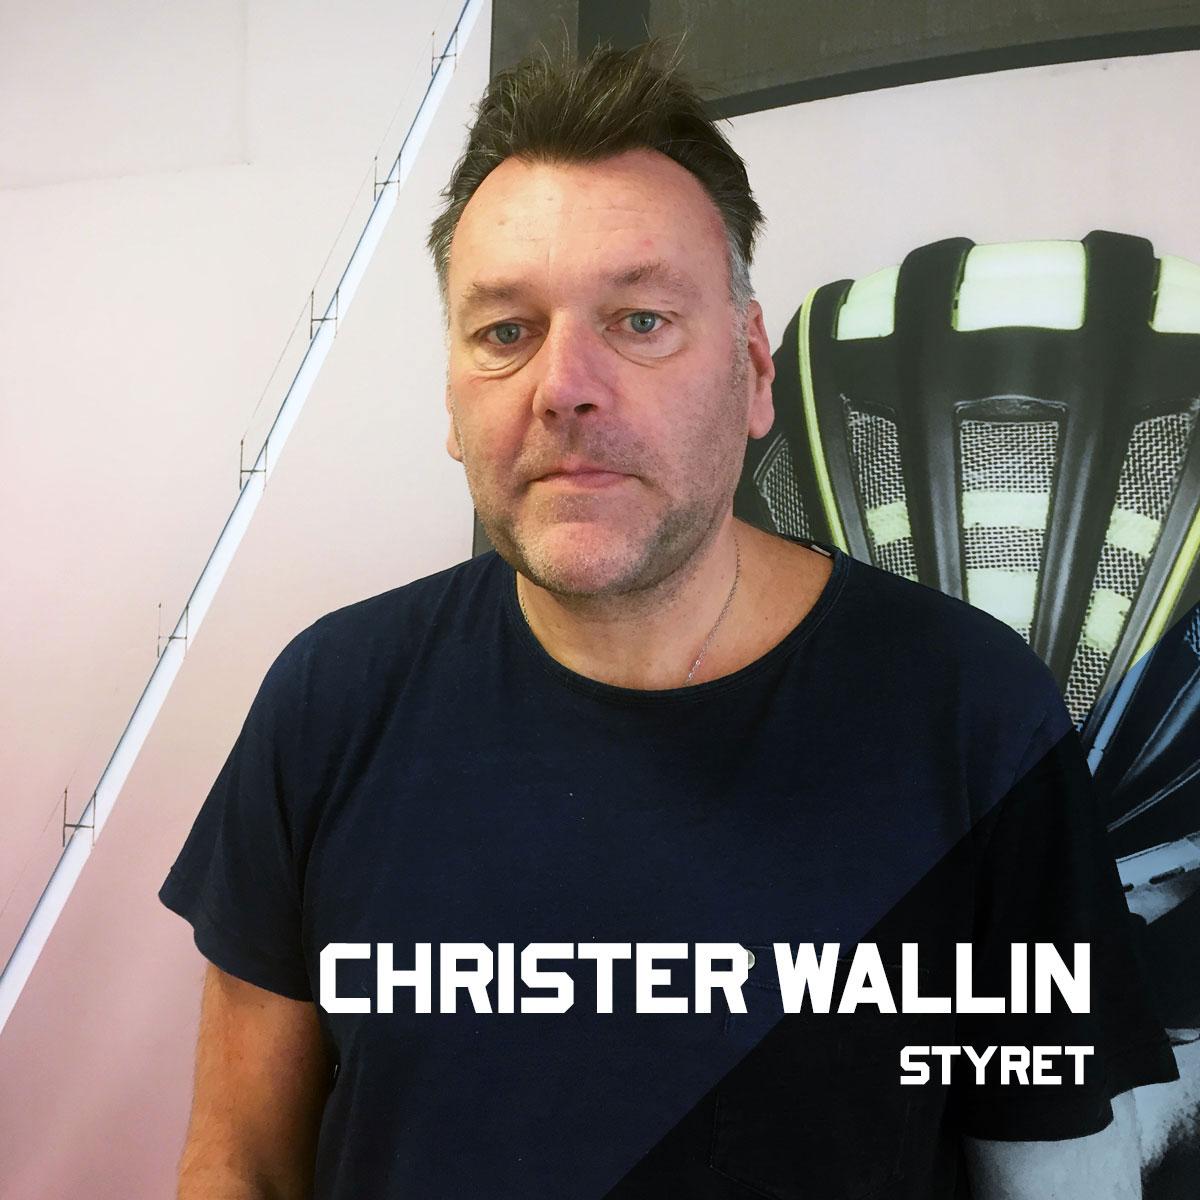 christer-wallin